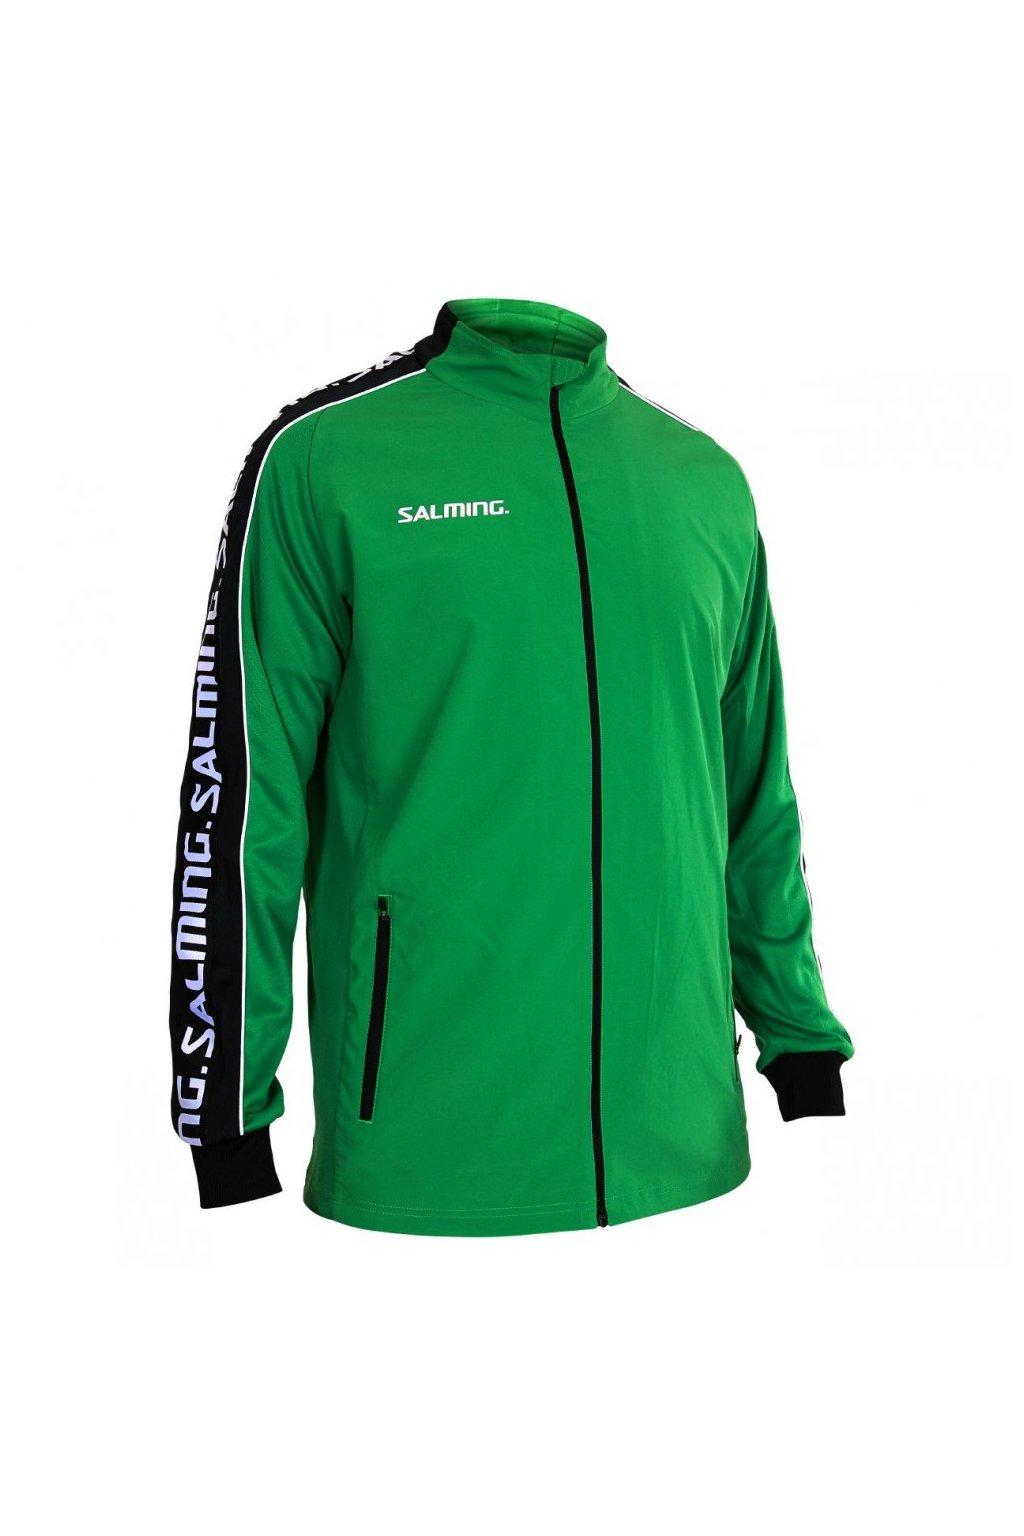 salming delta jacket men